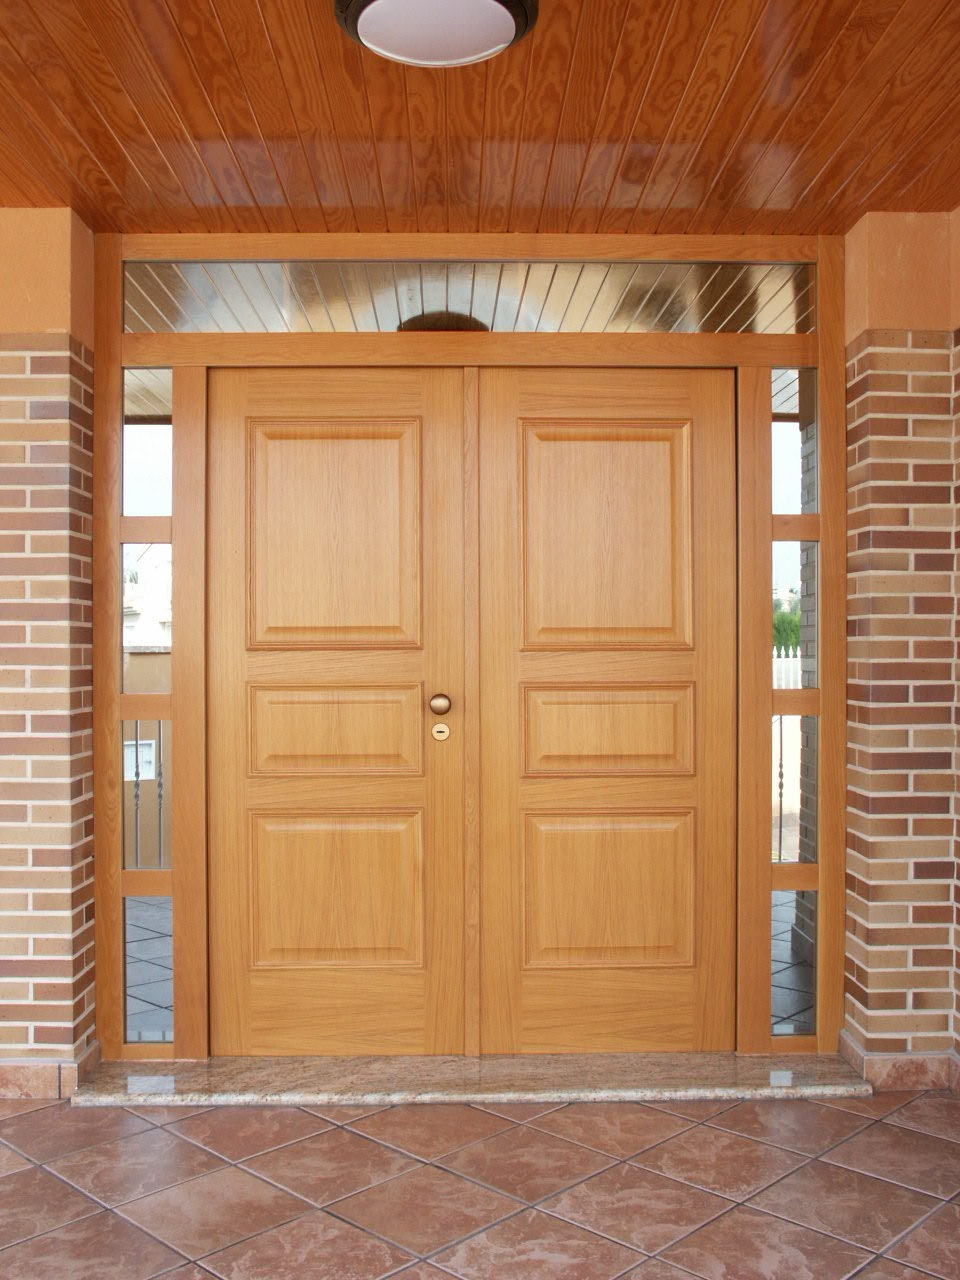 Puertas De Aluminio Of Puertas De Aluminio Doble Hoja Elegant Puerta De Ducha